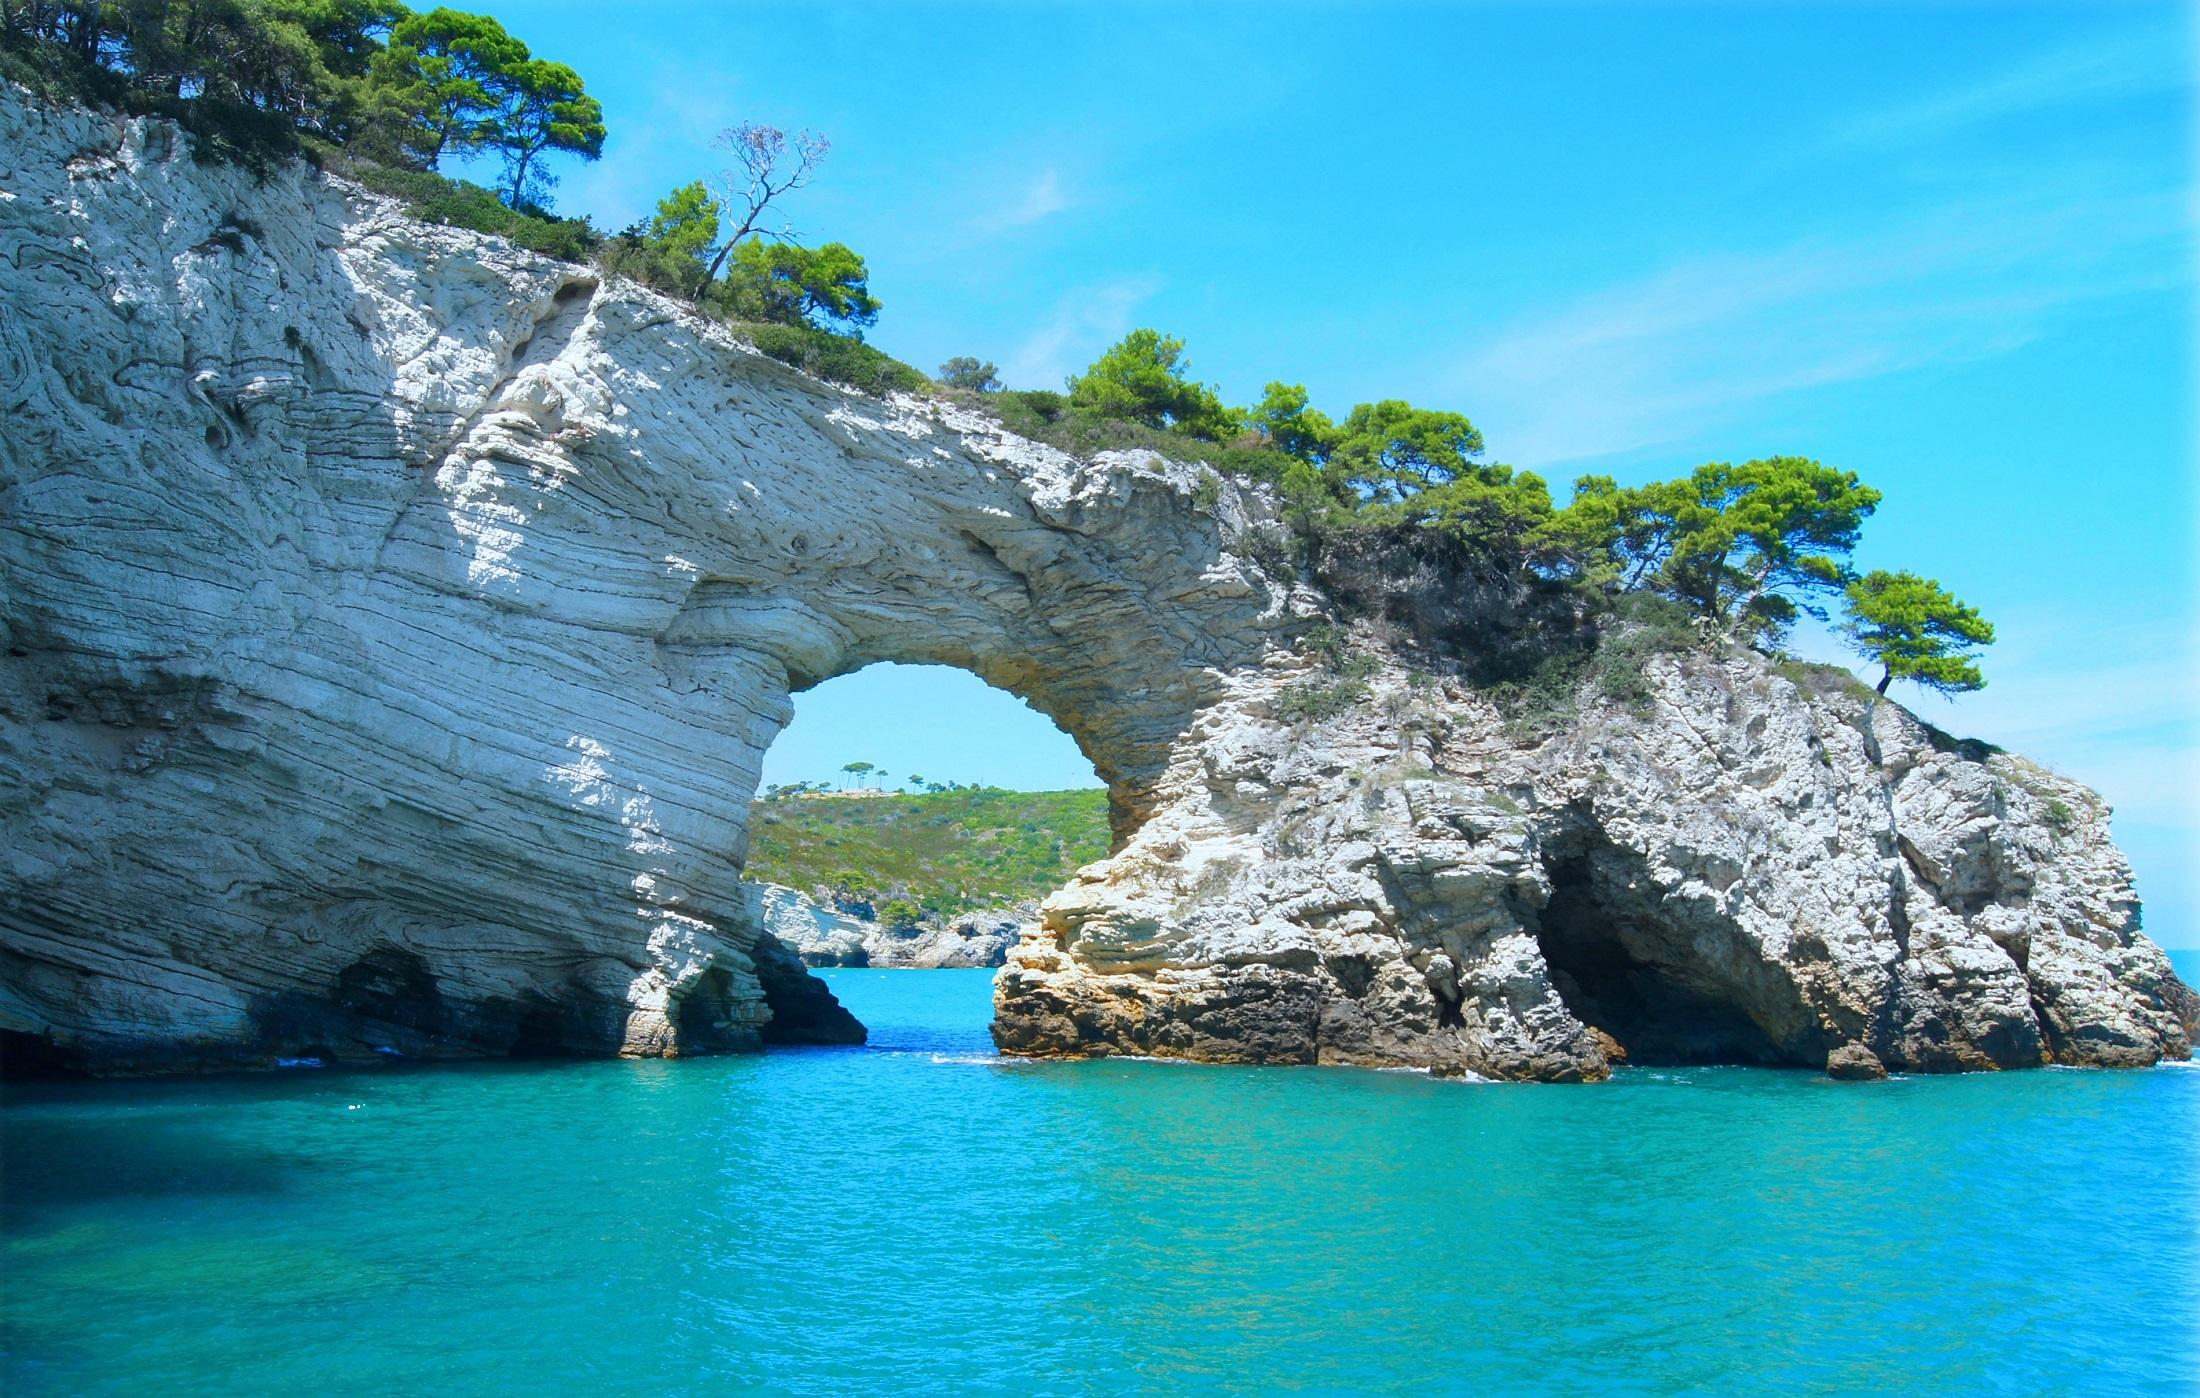 Free Images : landscape, coast, water, rock, ocean, sky, coastline ...